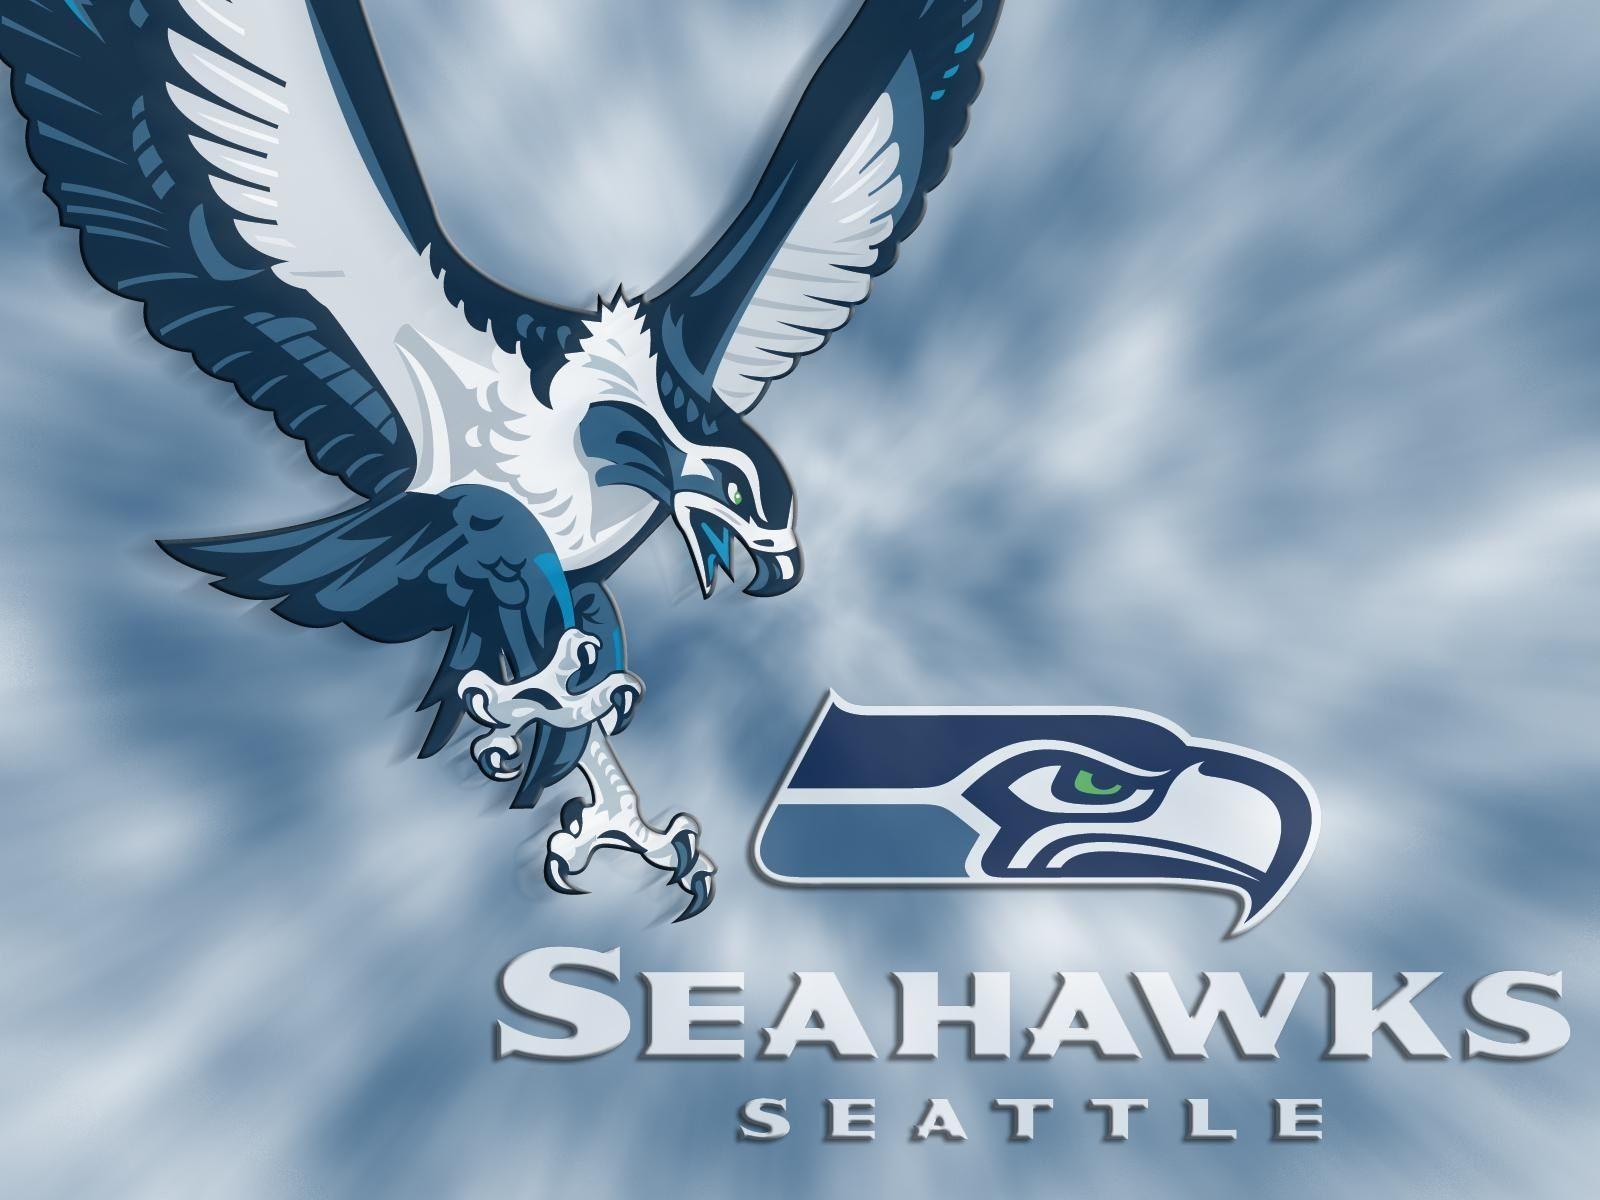 seahawk hd photo